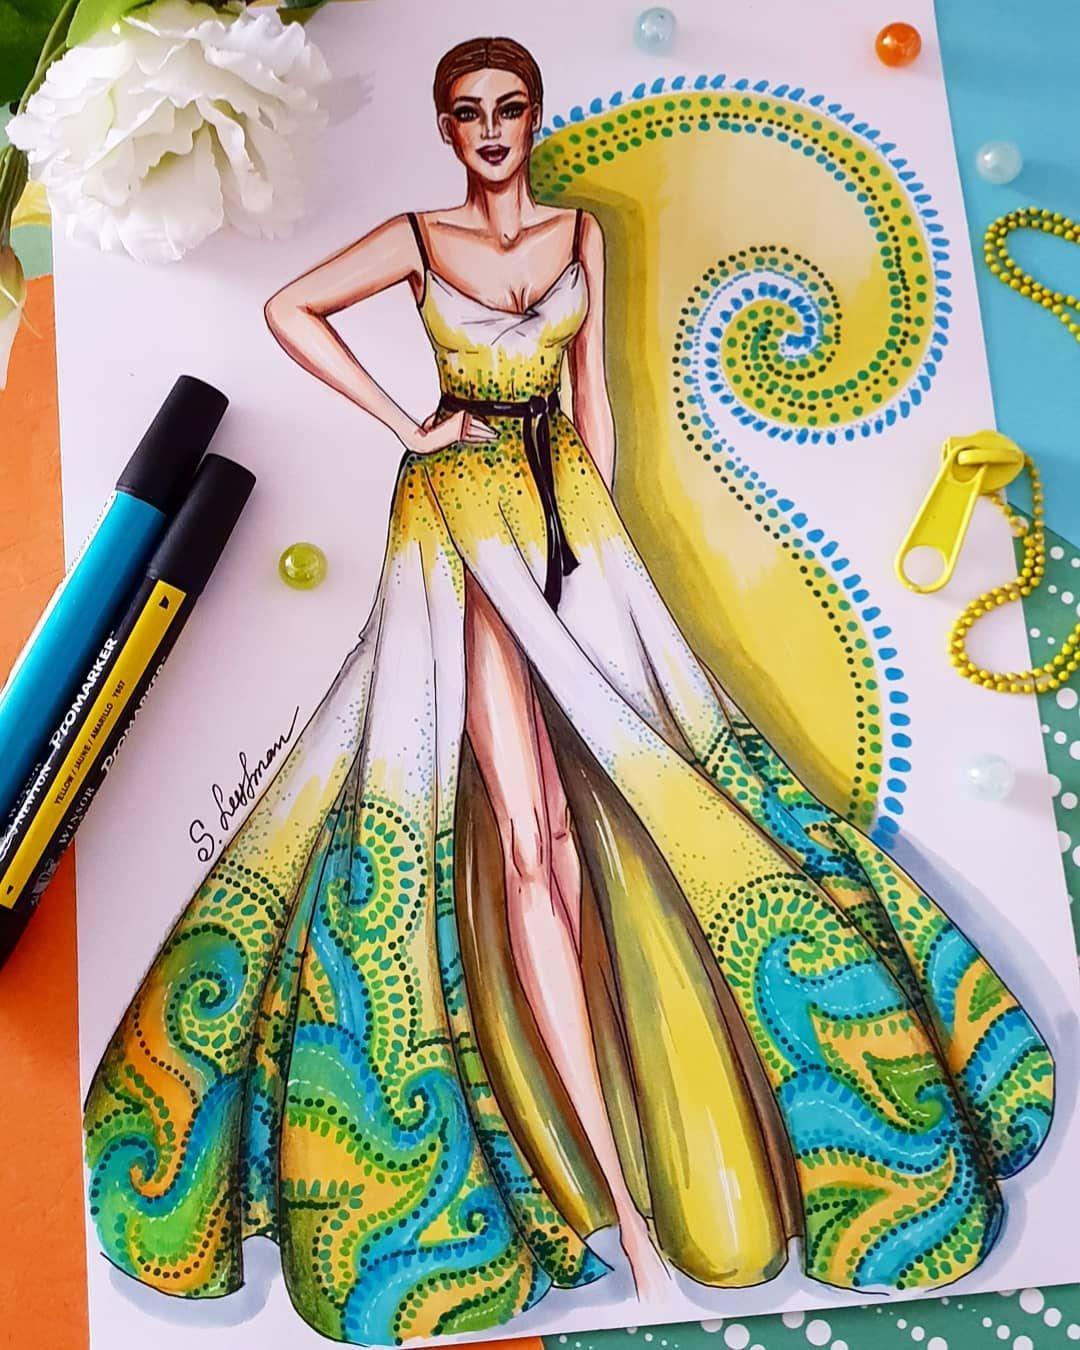 Sveta Slobodov Leyfman On Instagram What About Bright Summer Colors I Fashion Illustration Sketches Dresses Fashion Design Sketches Fashion Design Sketchbook